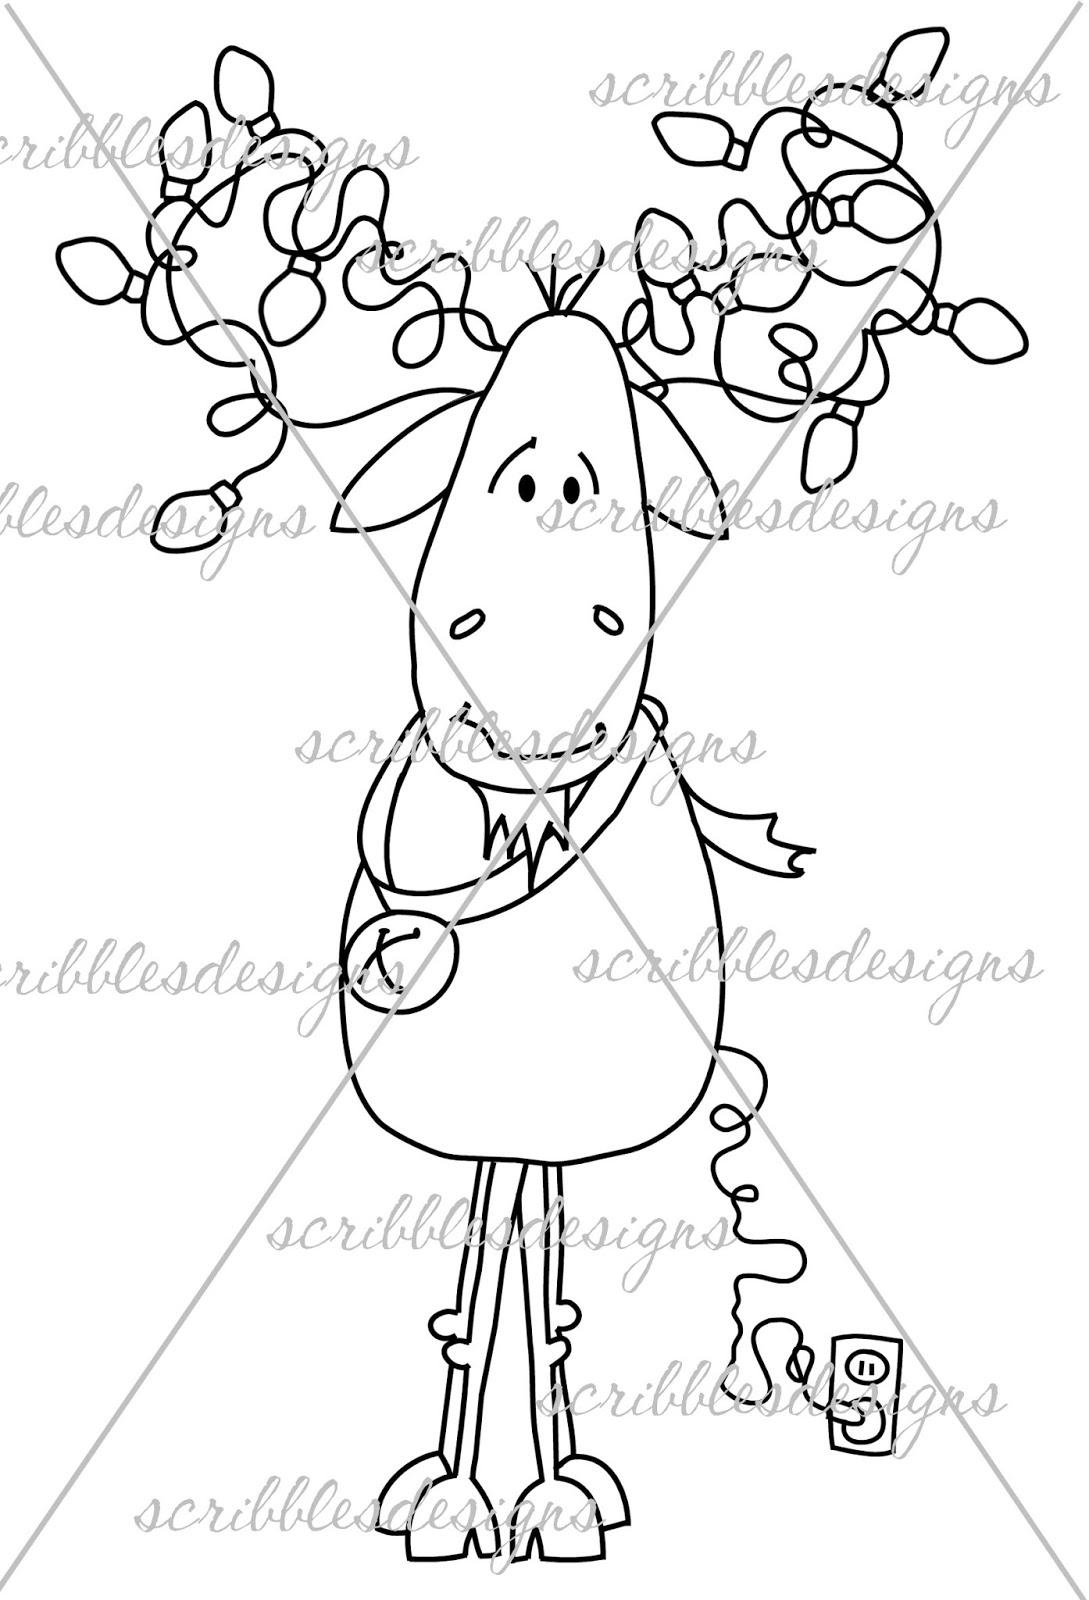 http://buyscribblesdesigns.blogspot.com/2014/10/724-lit-up-toomoose-300.html